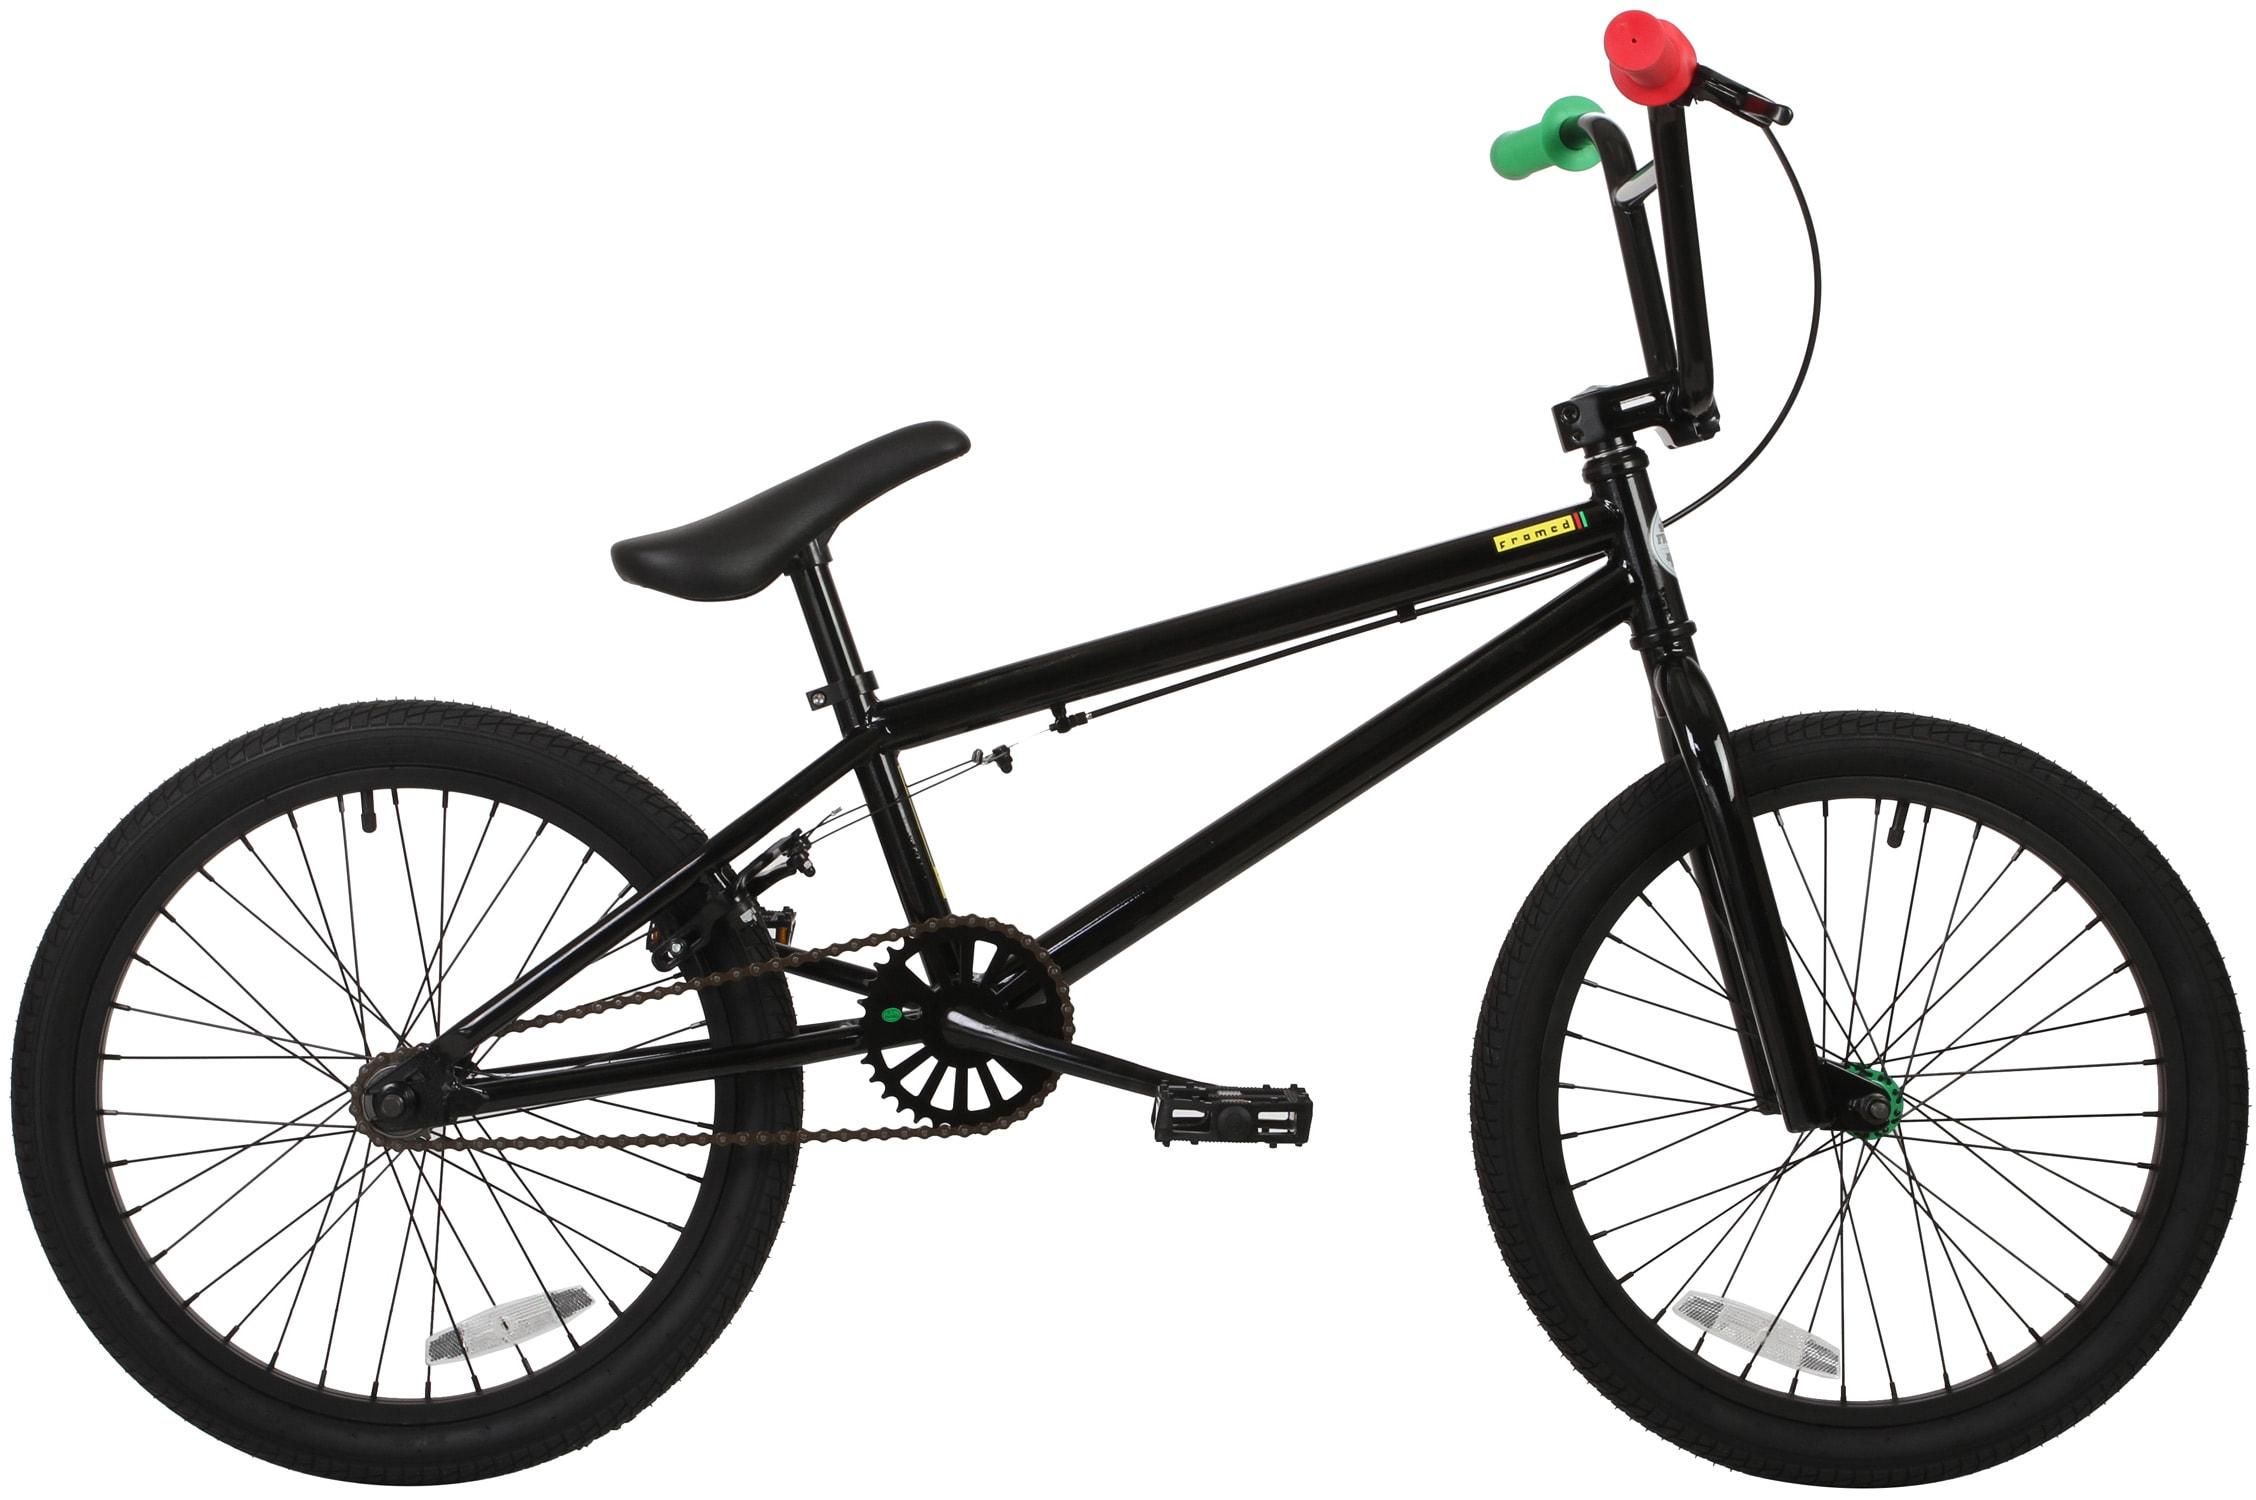 Impacto Enmarcado 20 bicicleta BMX Talla 20 in (approx. 50.80 cm) | eBay